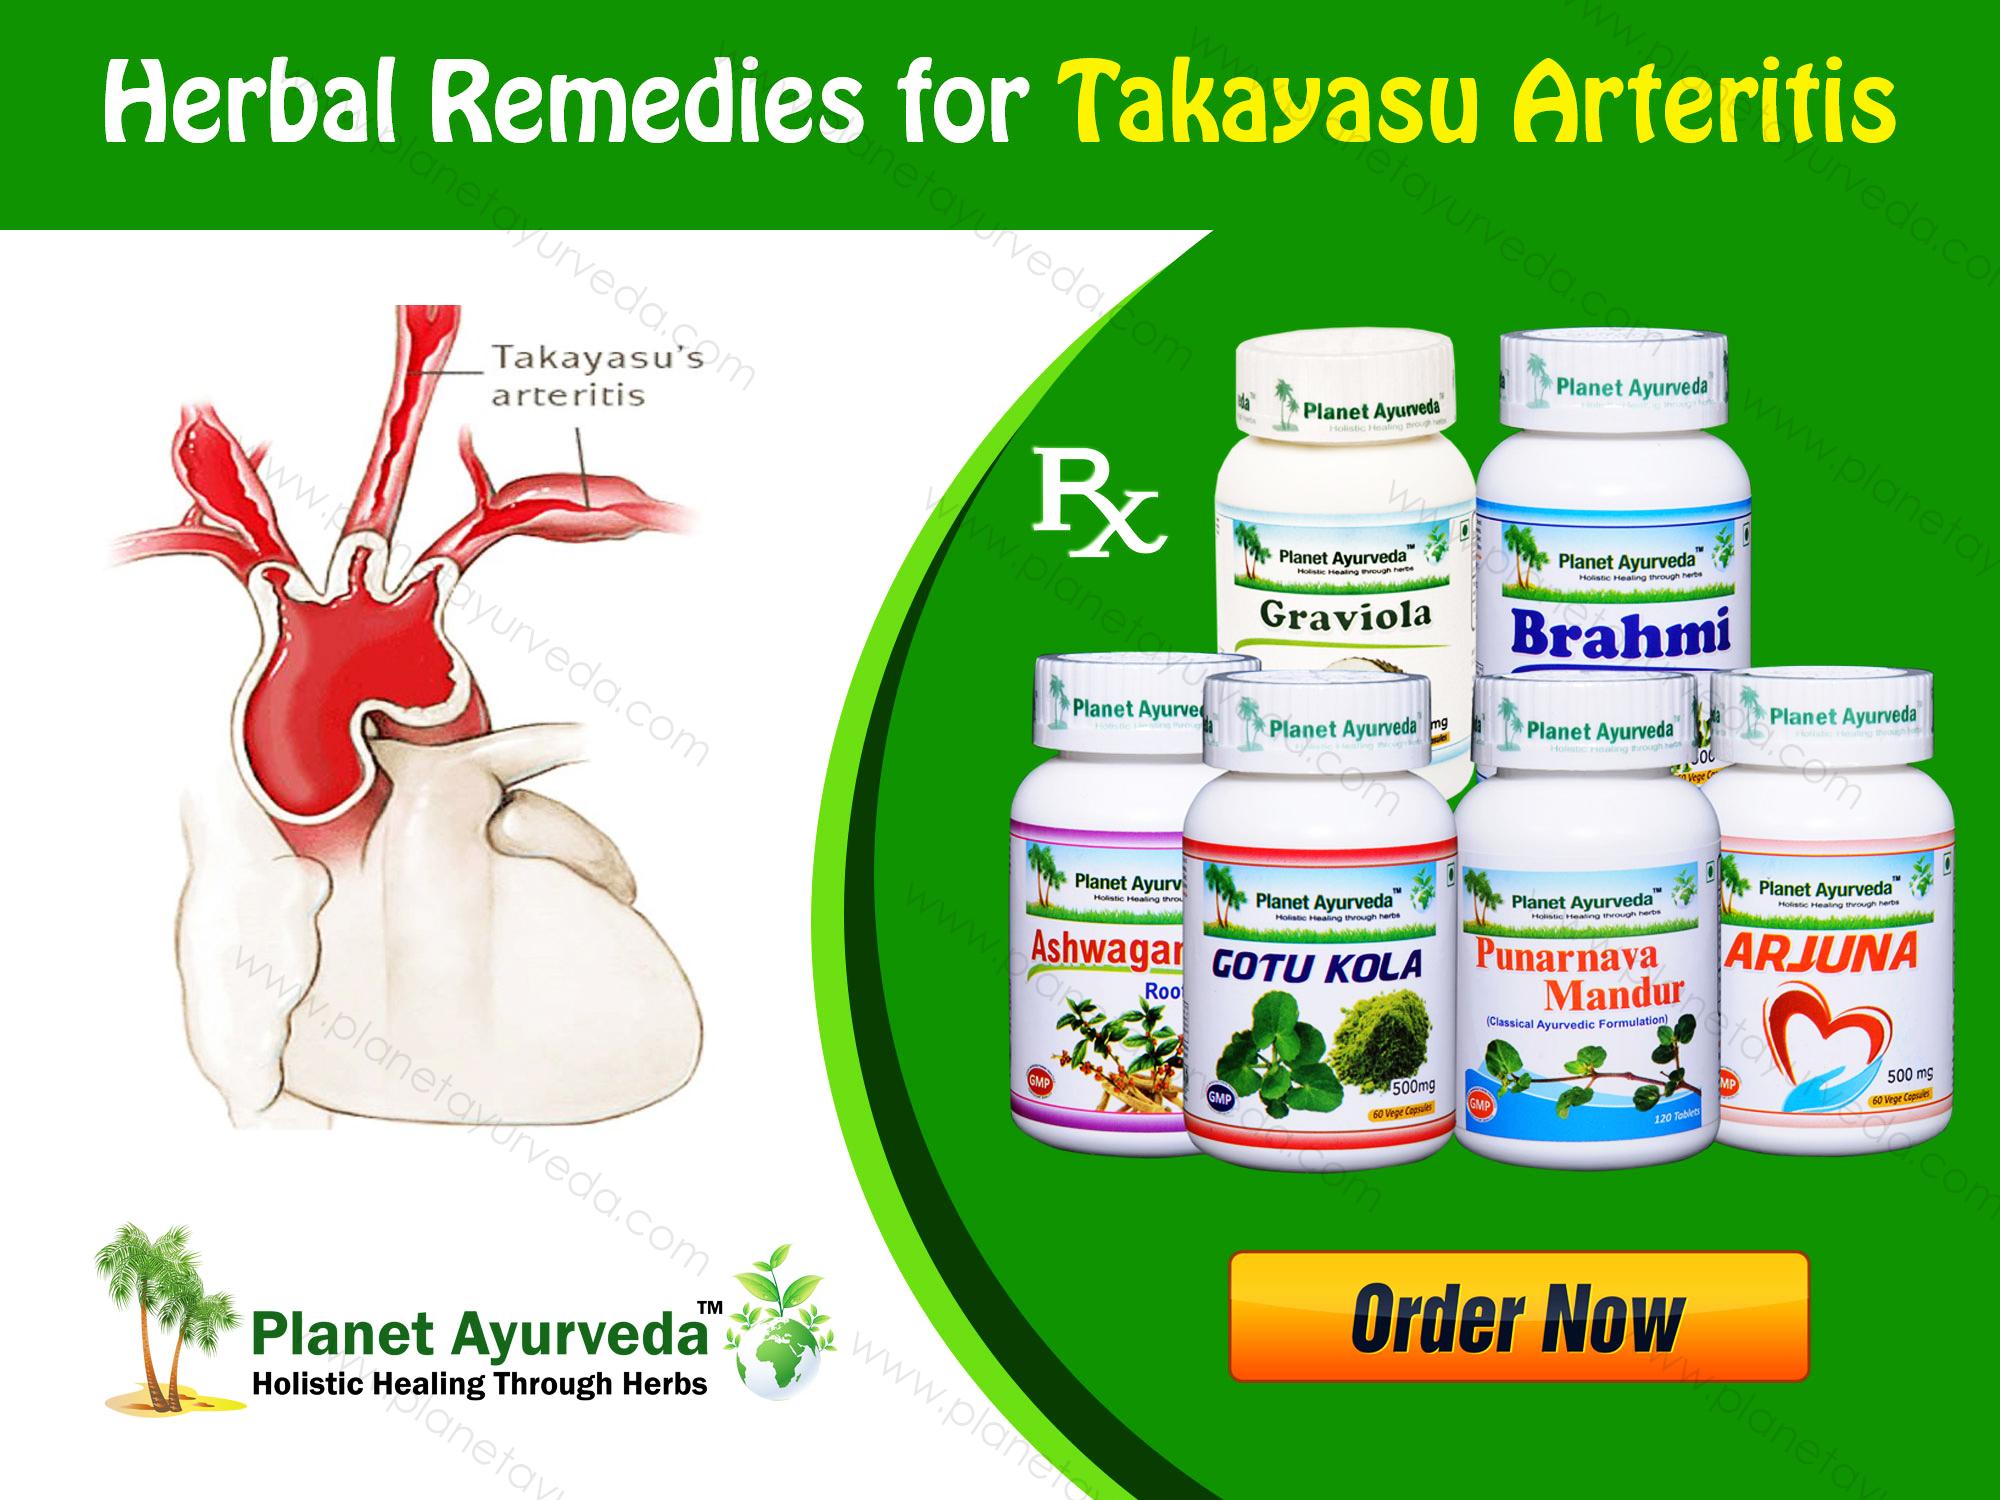 Herbal-Remedies-for-takayasu-Arteritis